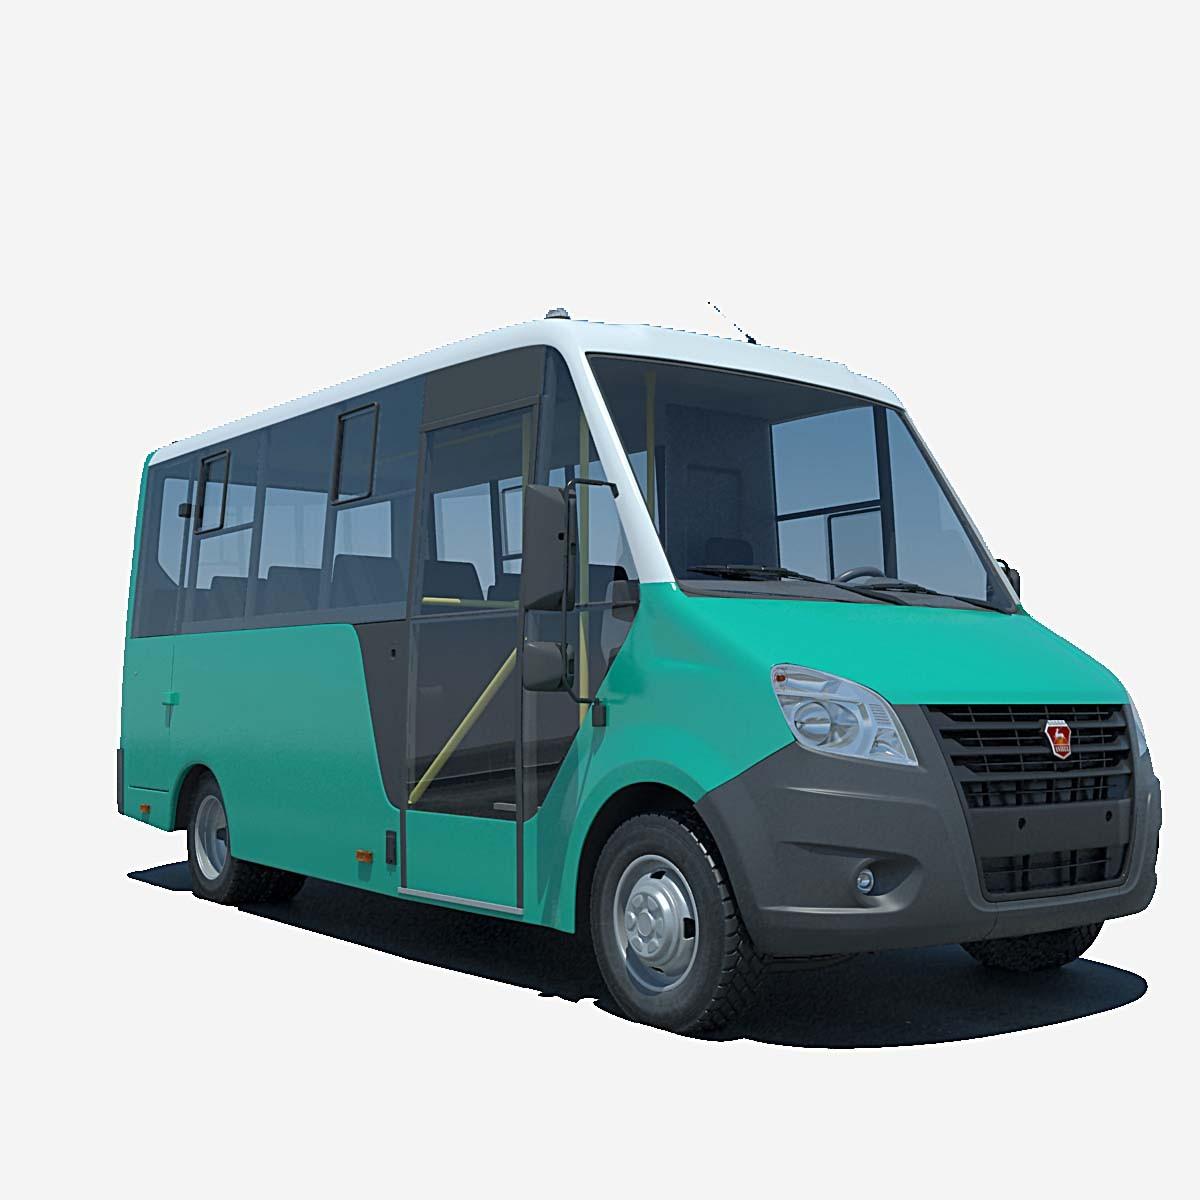 Turbo Microbus: 3d Model Russian Gazelle Bus